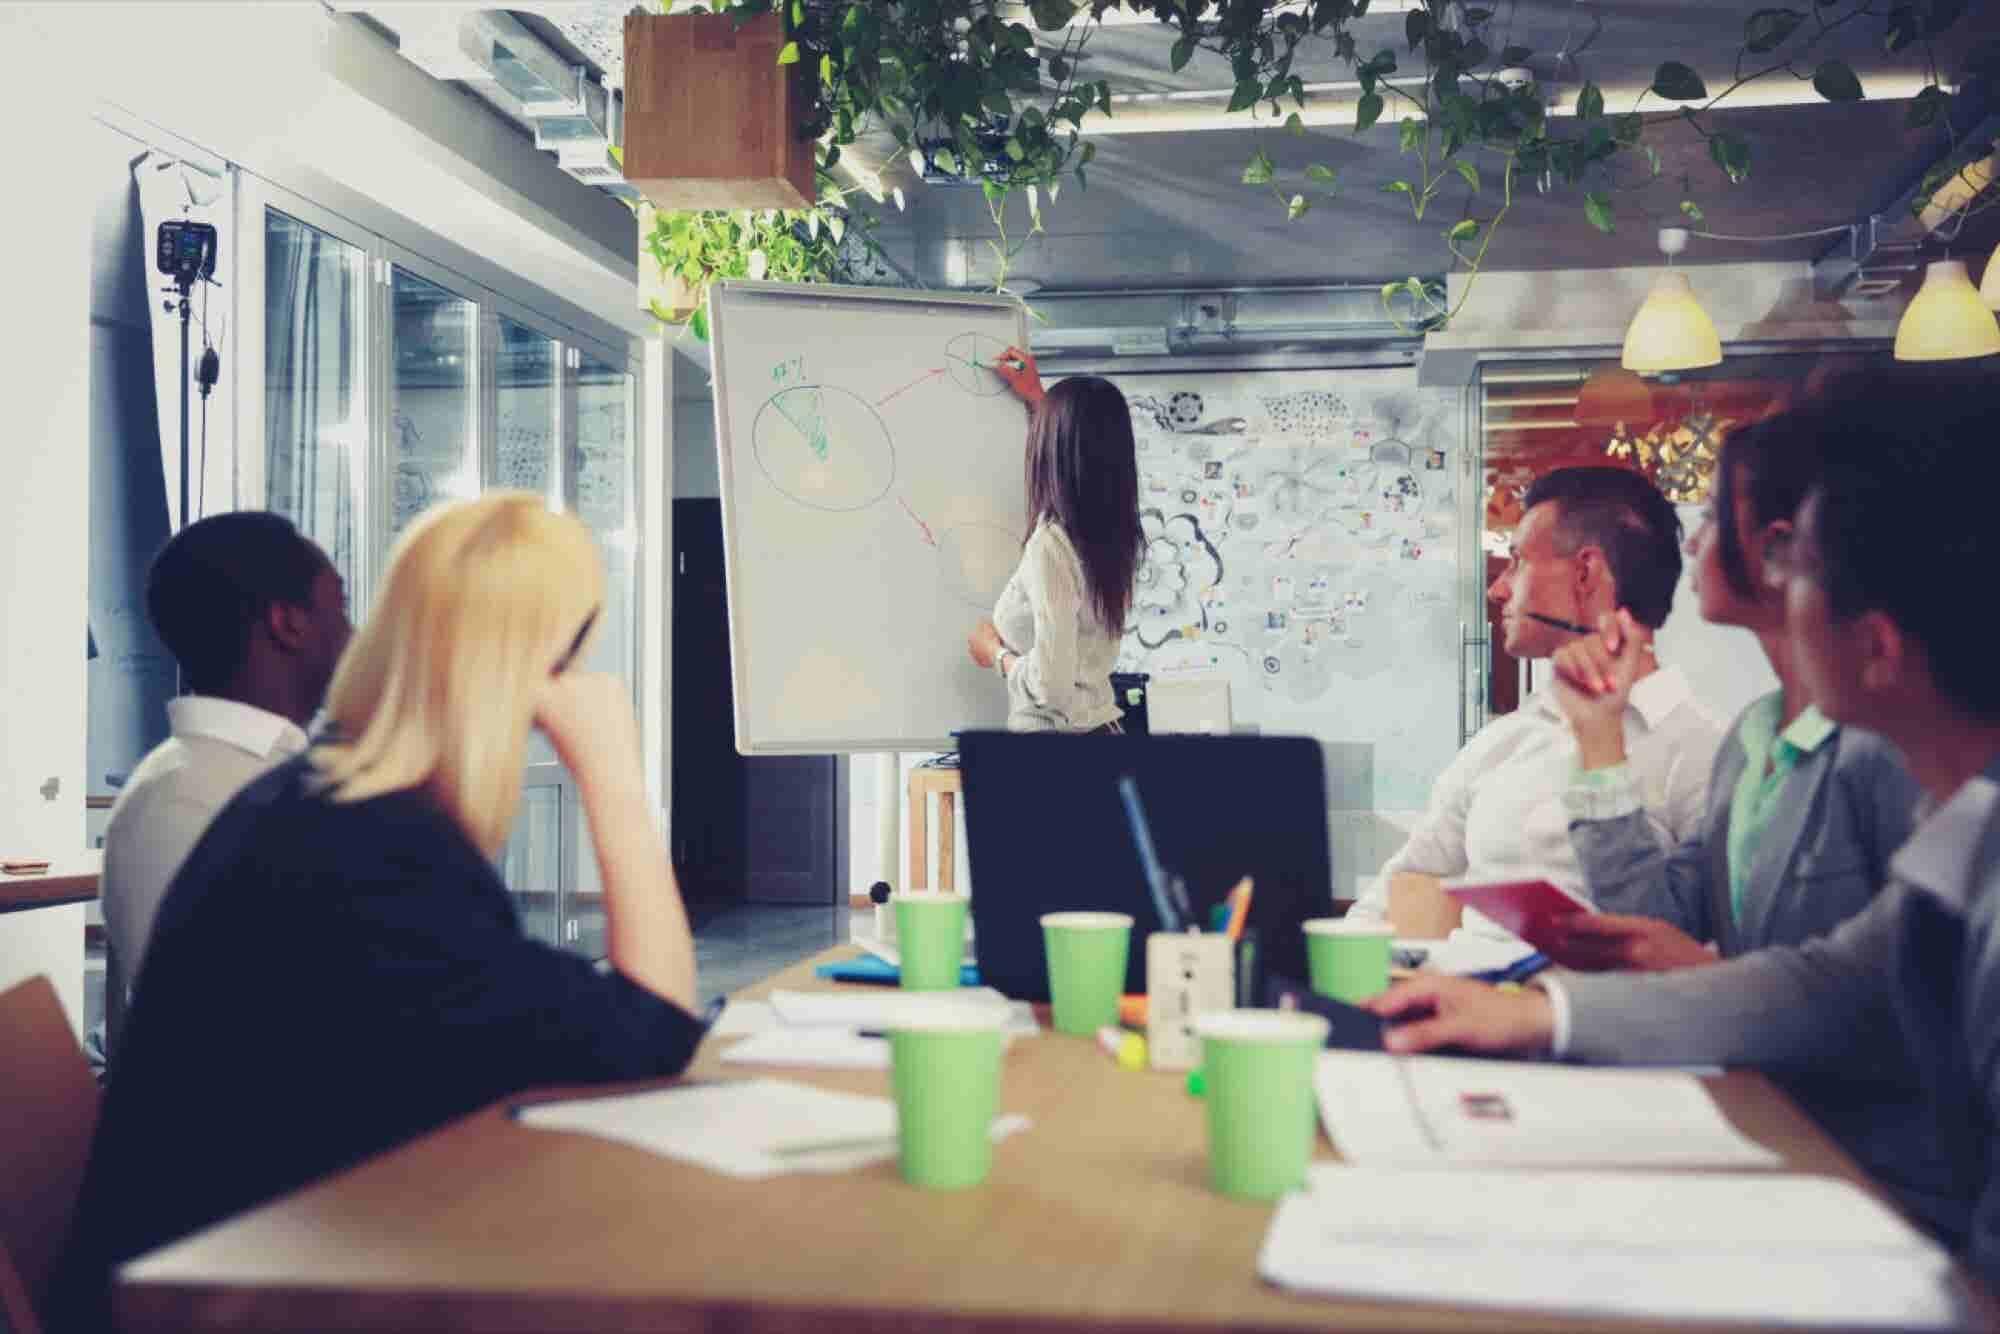 Workspace Environment Matters, Says Ergonomics